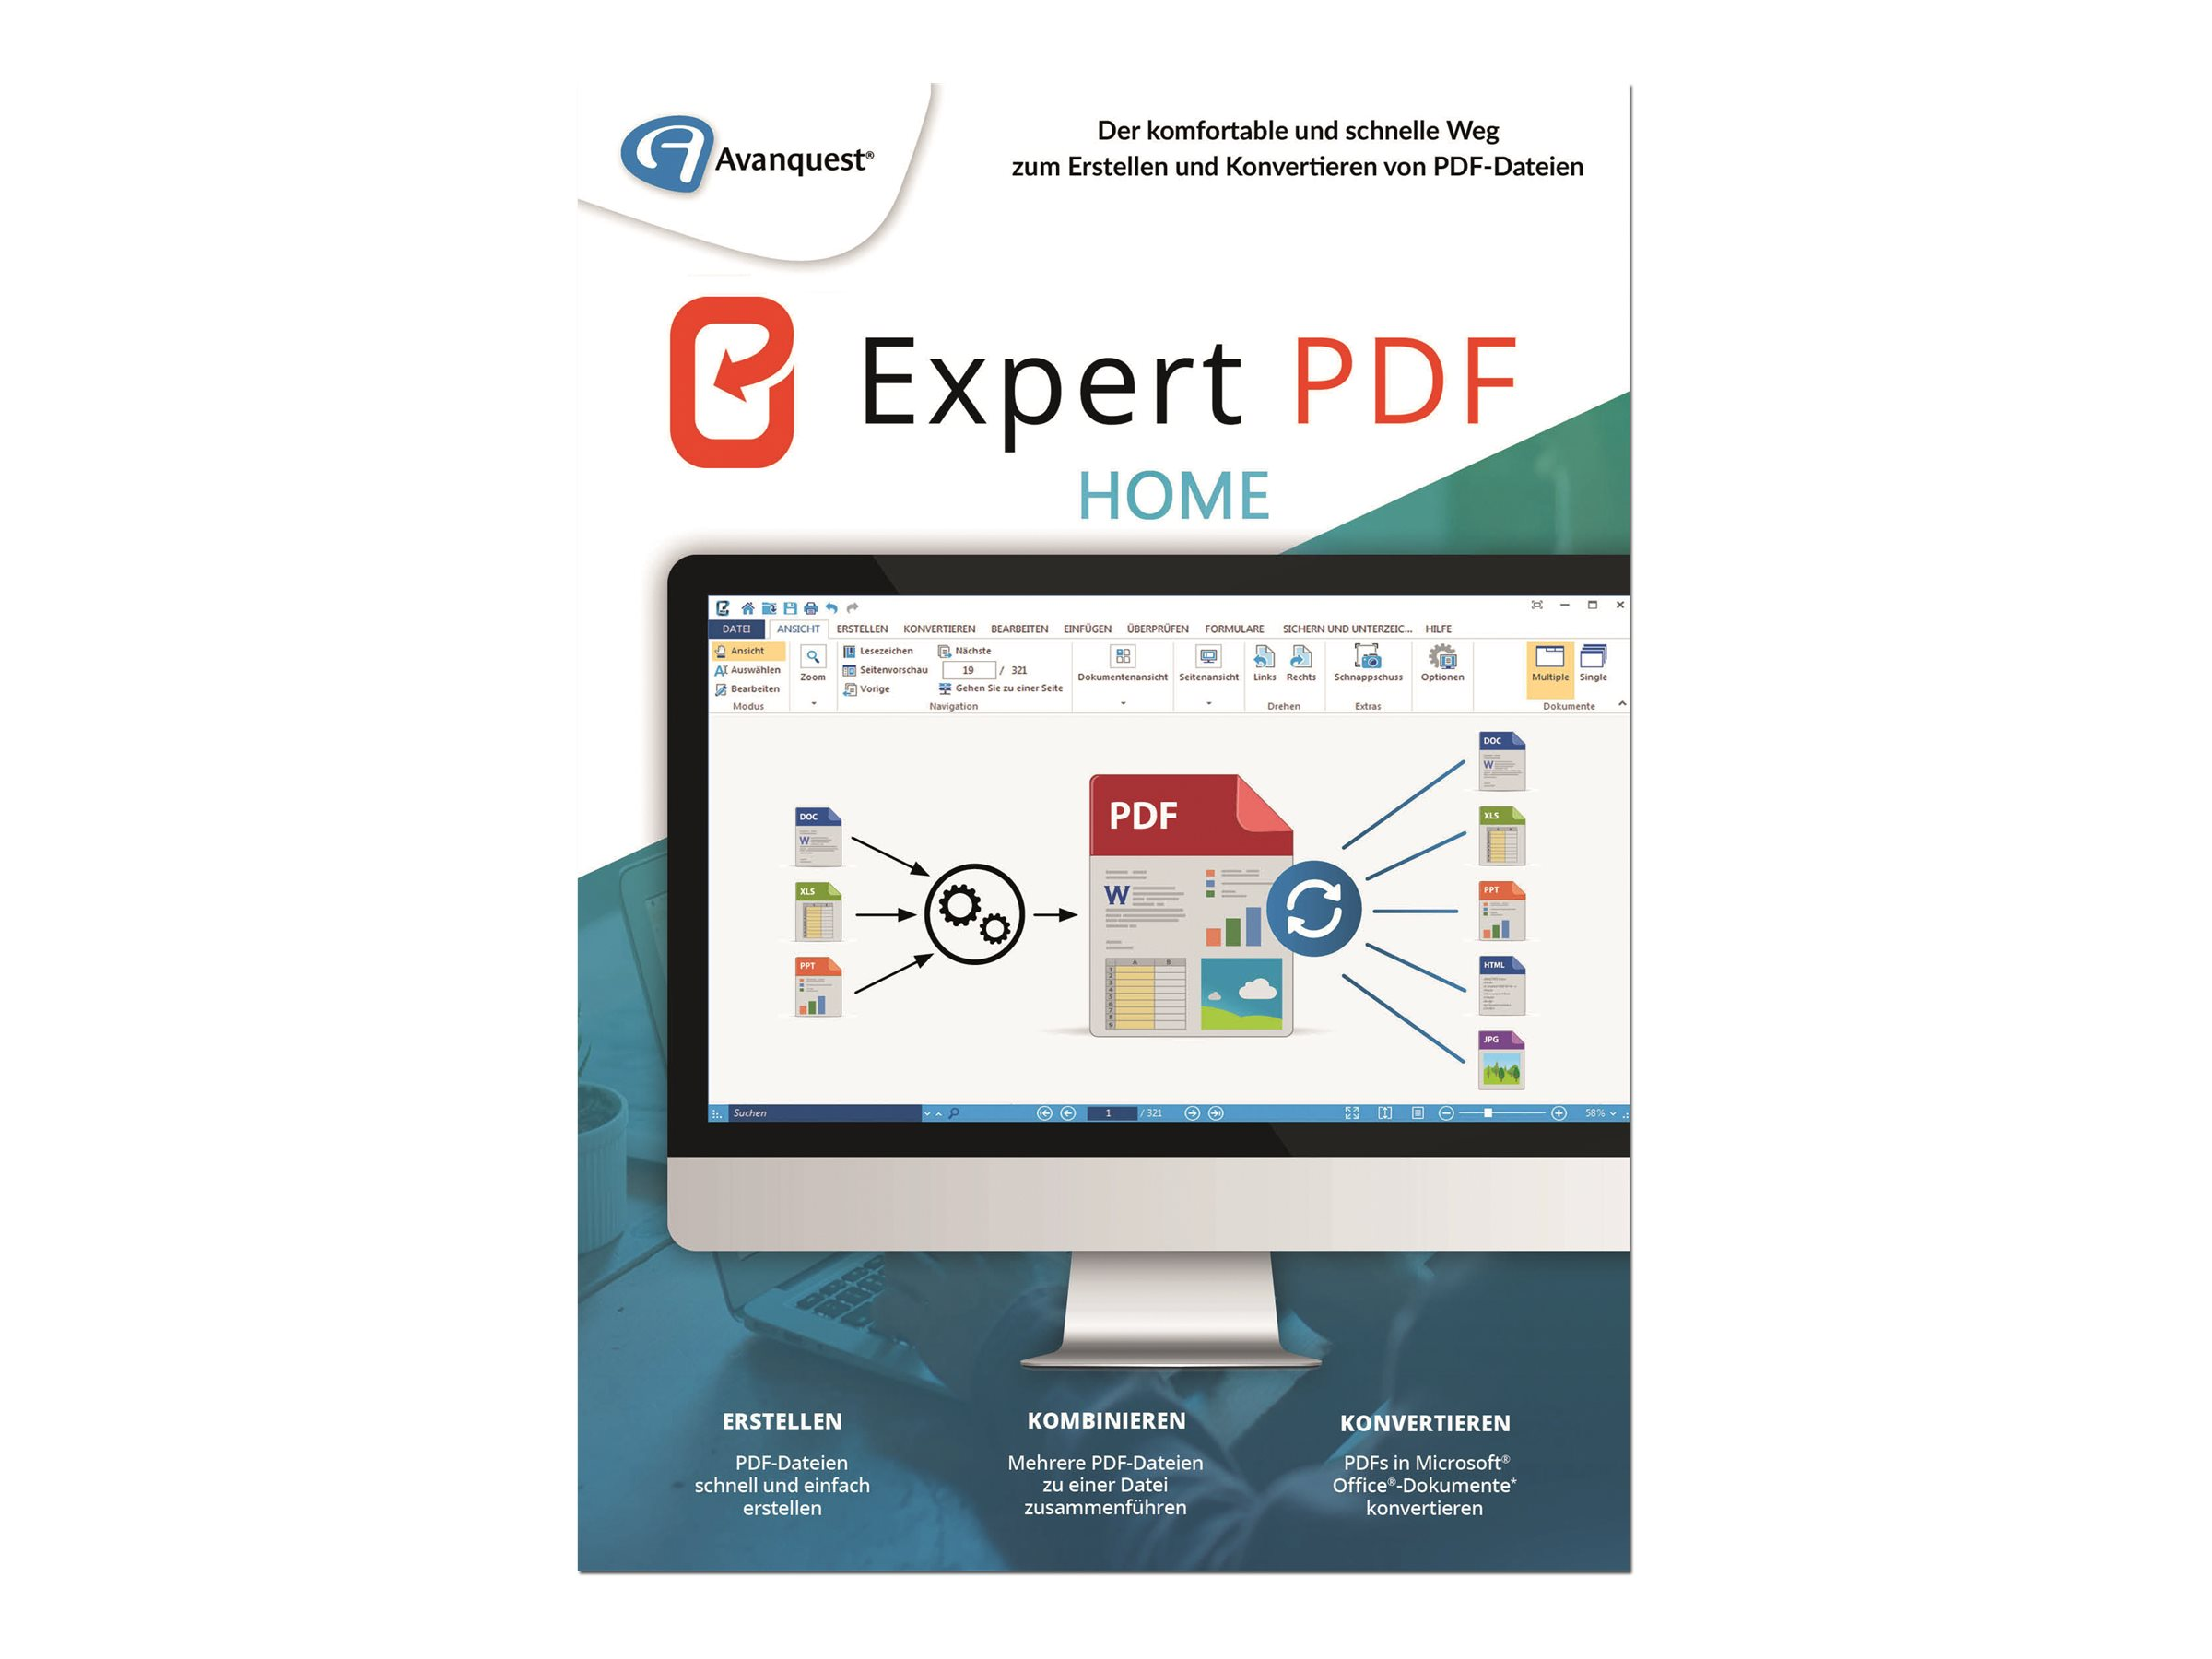 Avanquest Software eXPert PDF Home - (v. 14) - Lizenz - 1 Benutzer